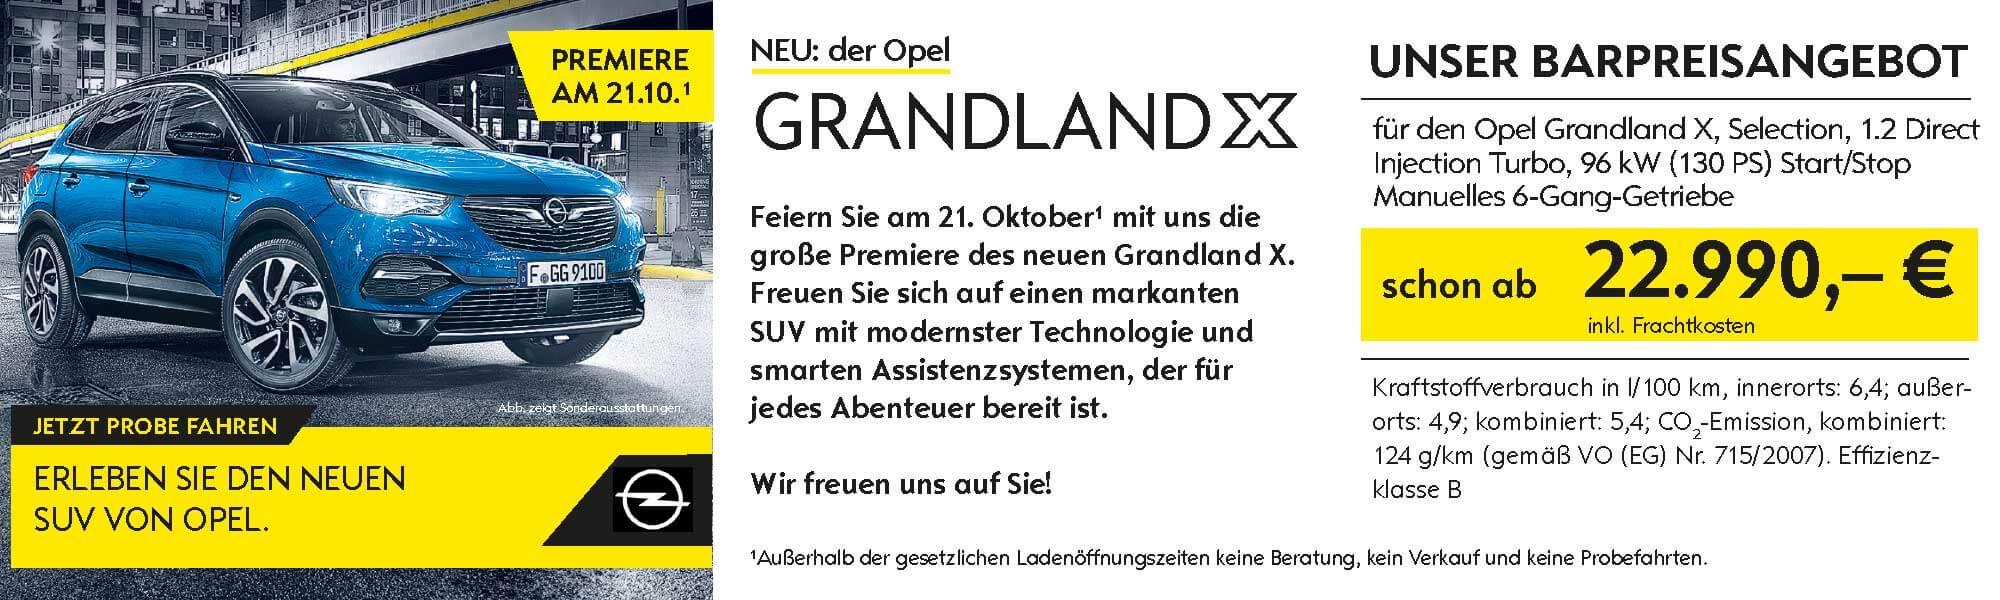 Der Opel Grandland X, Premiere bei Ulmen am 21.10.1017